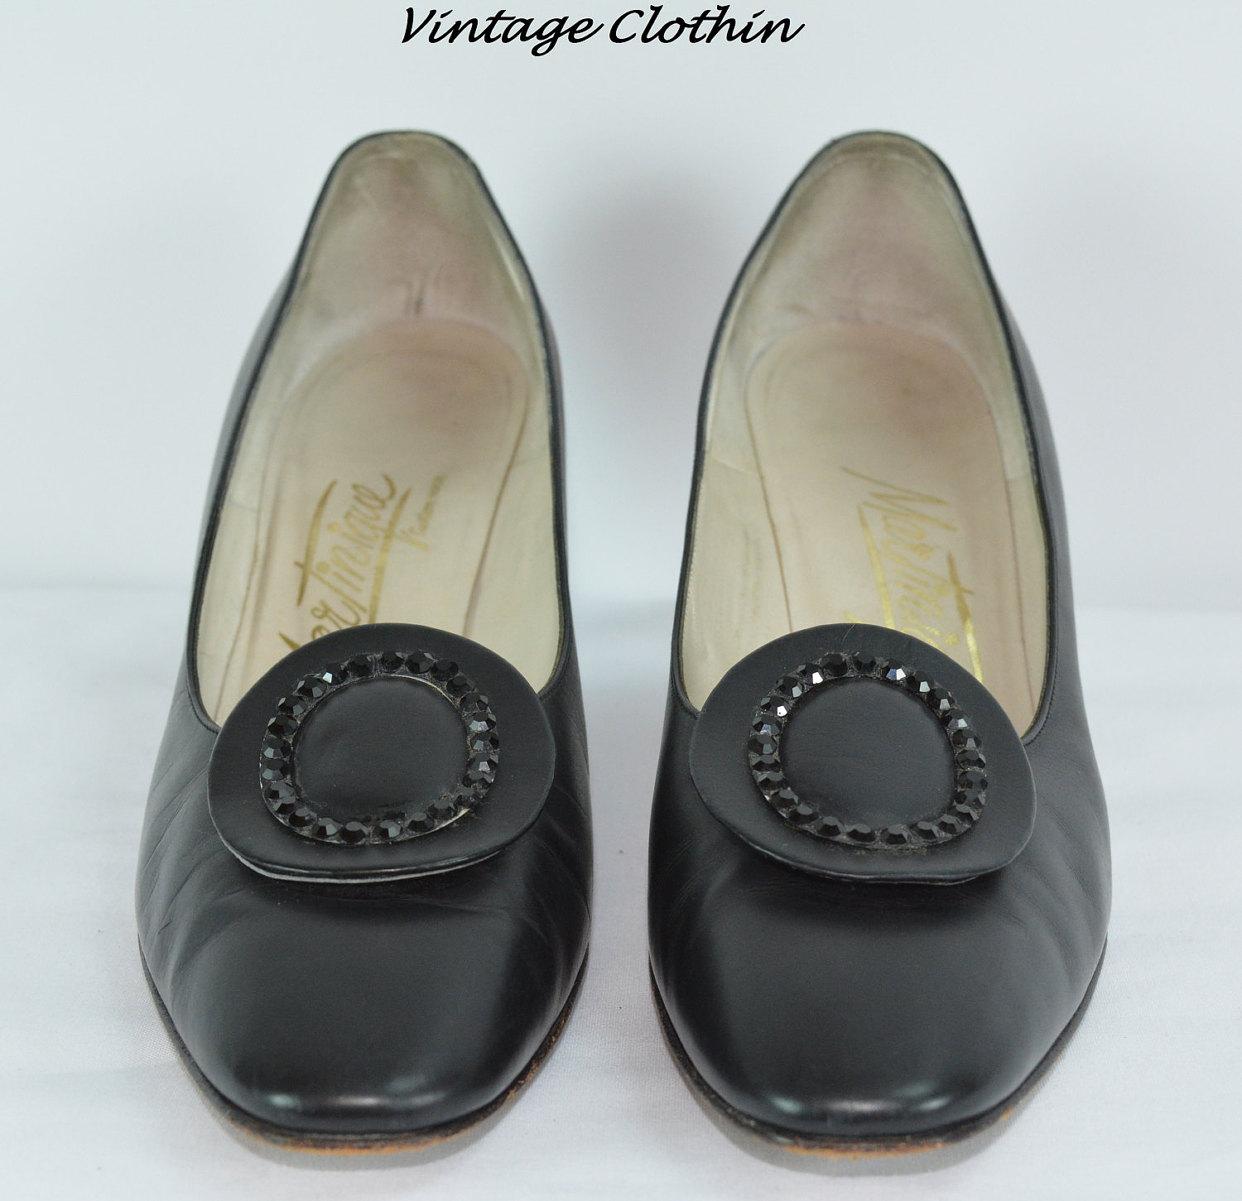 c1950s Martinique Black Leather Kitten Heel Pumps